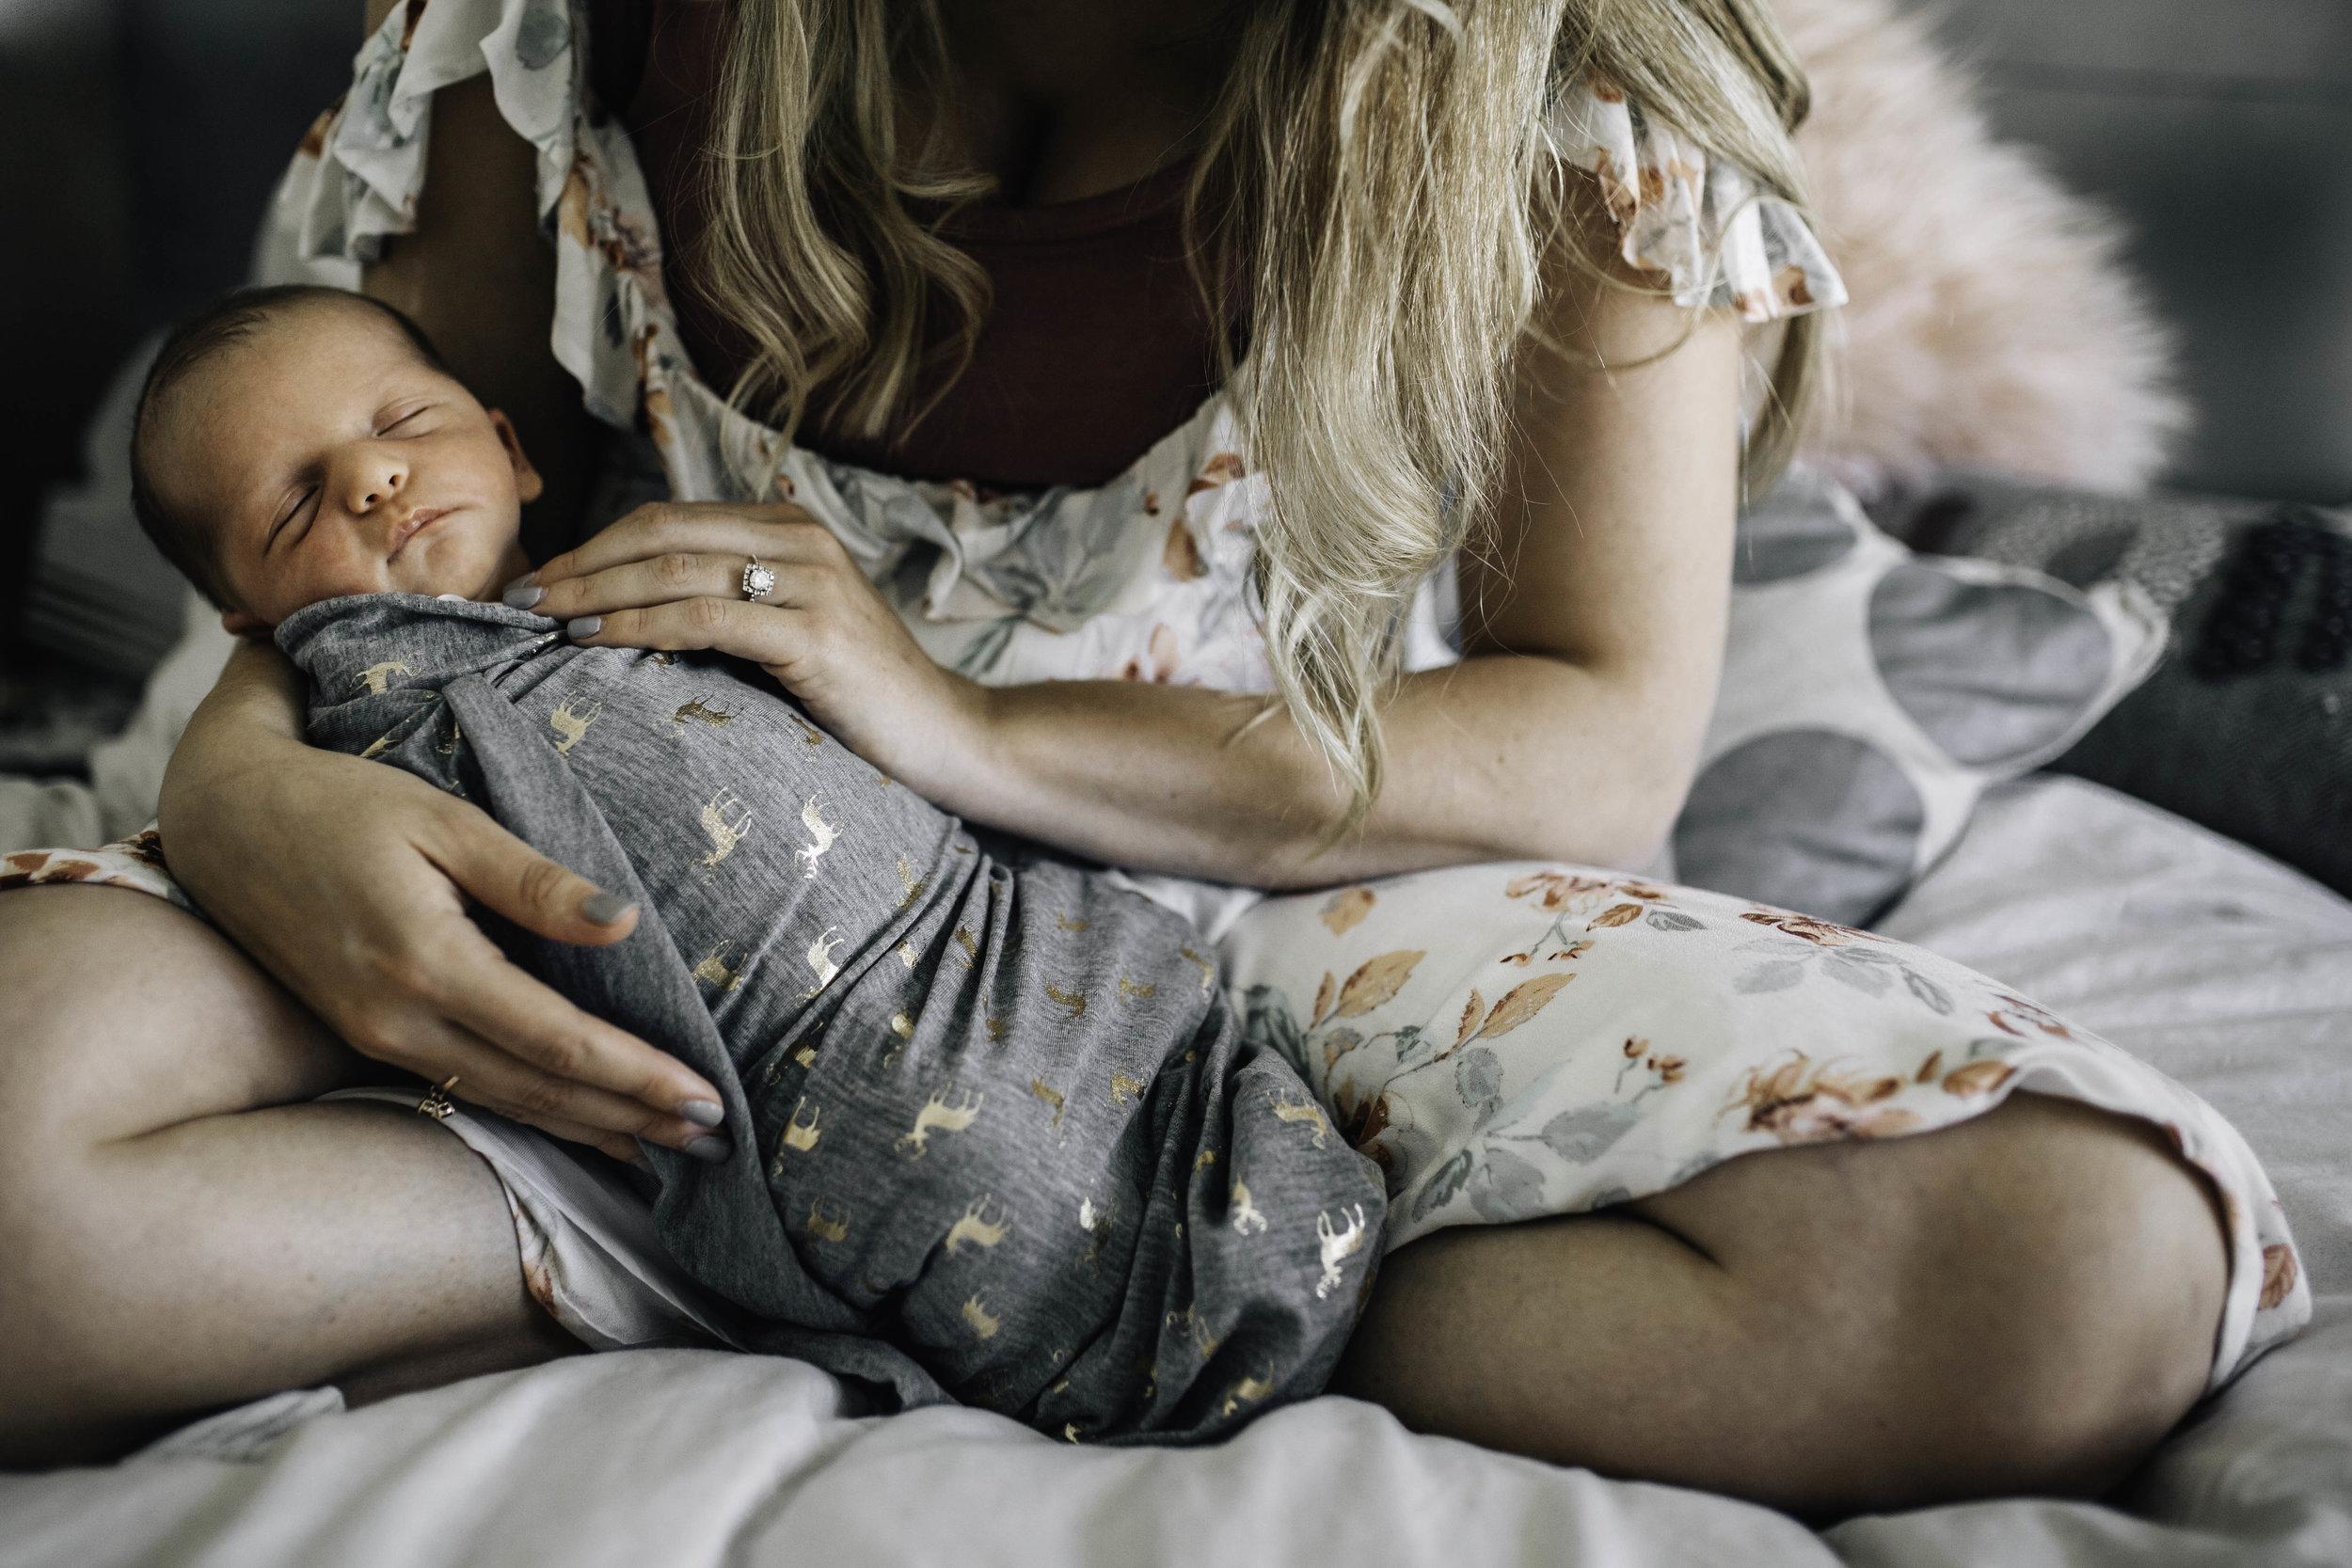 mother-cradling-newborn-son-in-her-arms.jpg